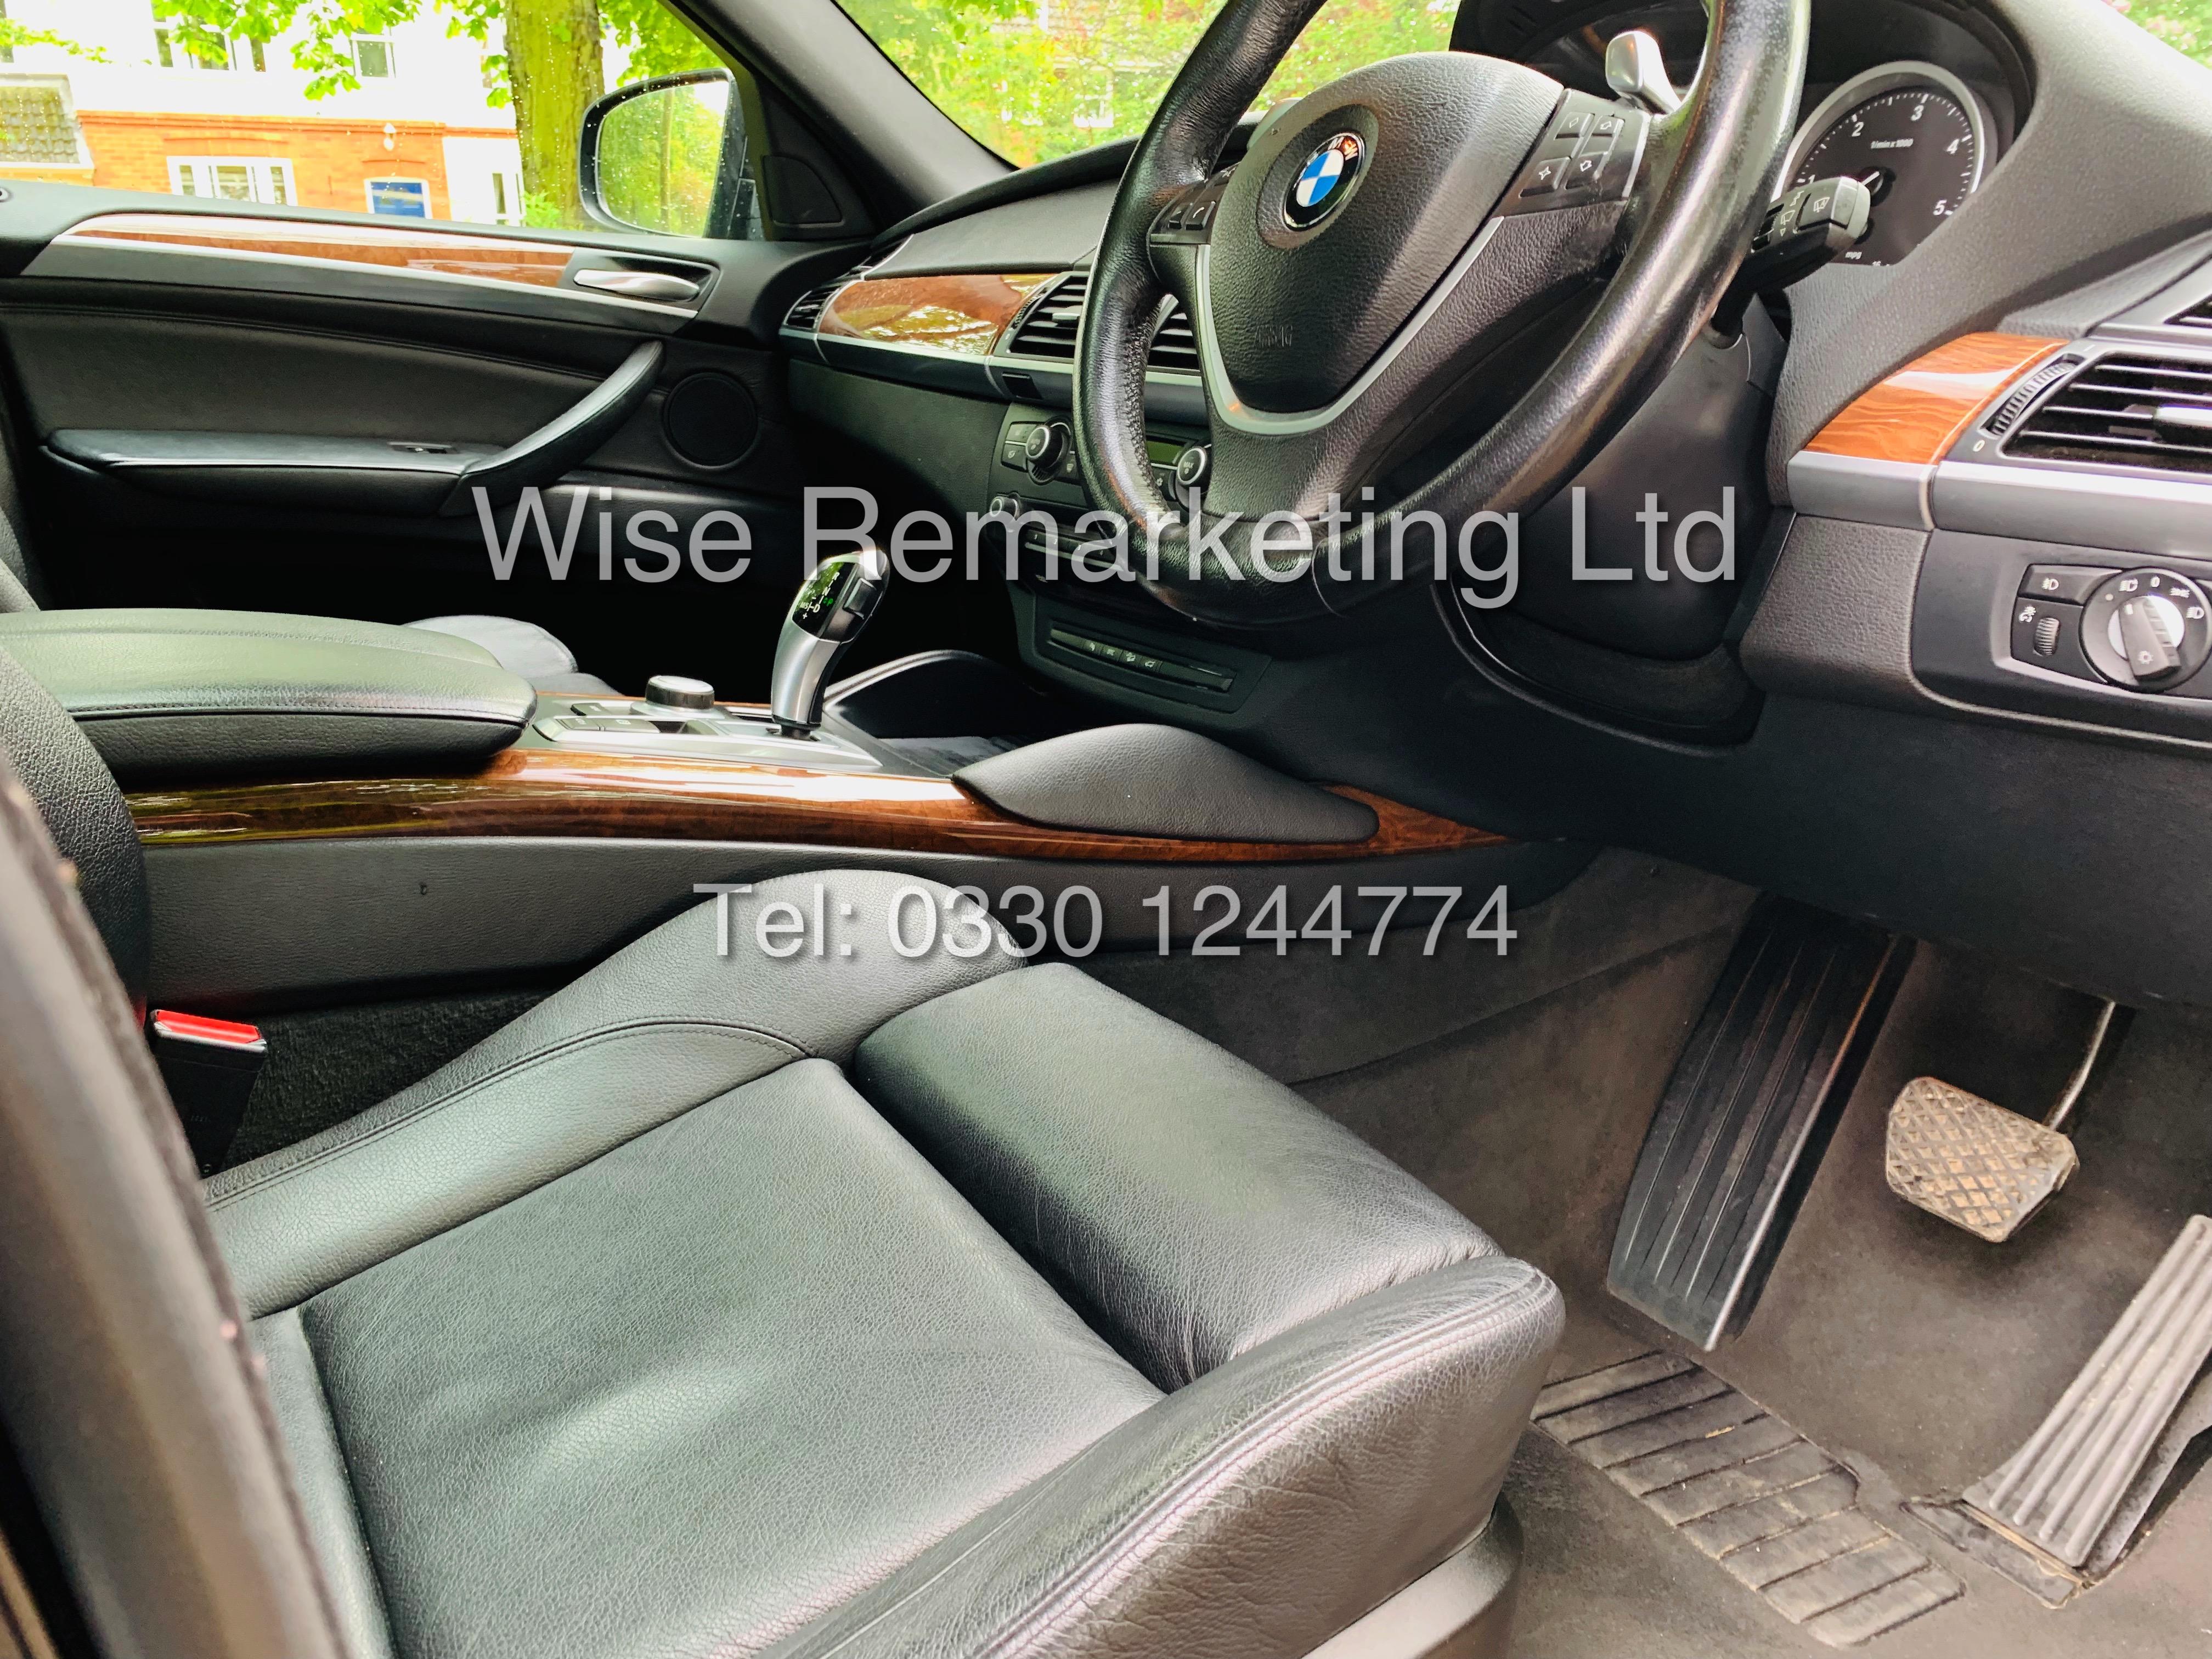 BMW X6 XDRIVE 35D AUTO (2009 SPEC) *1 PREVIOUS OWNER* PARKING AID - SAT NAV - FSH - Image 23 of 25